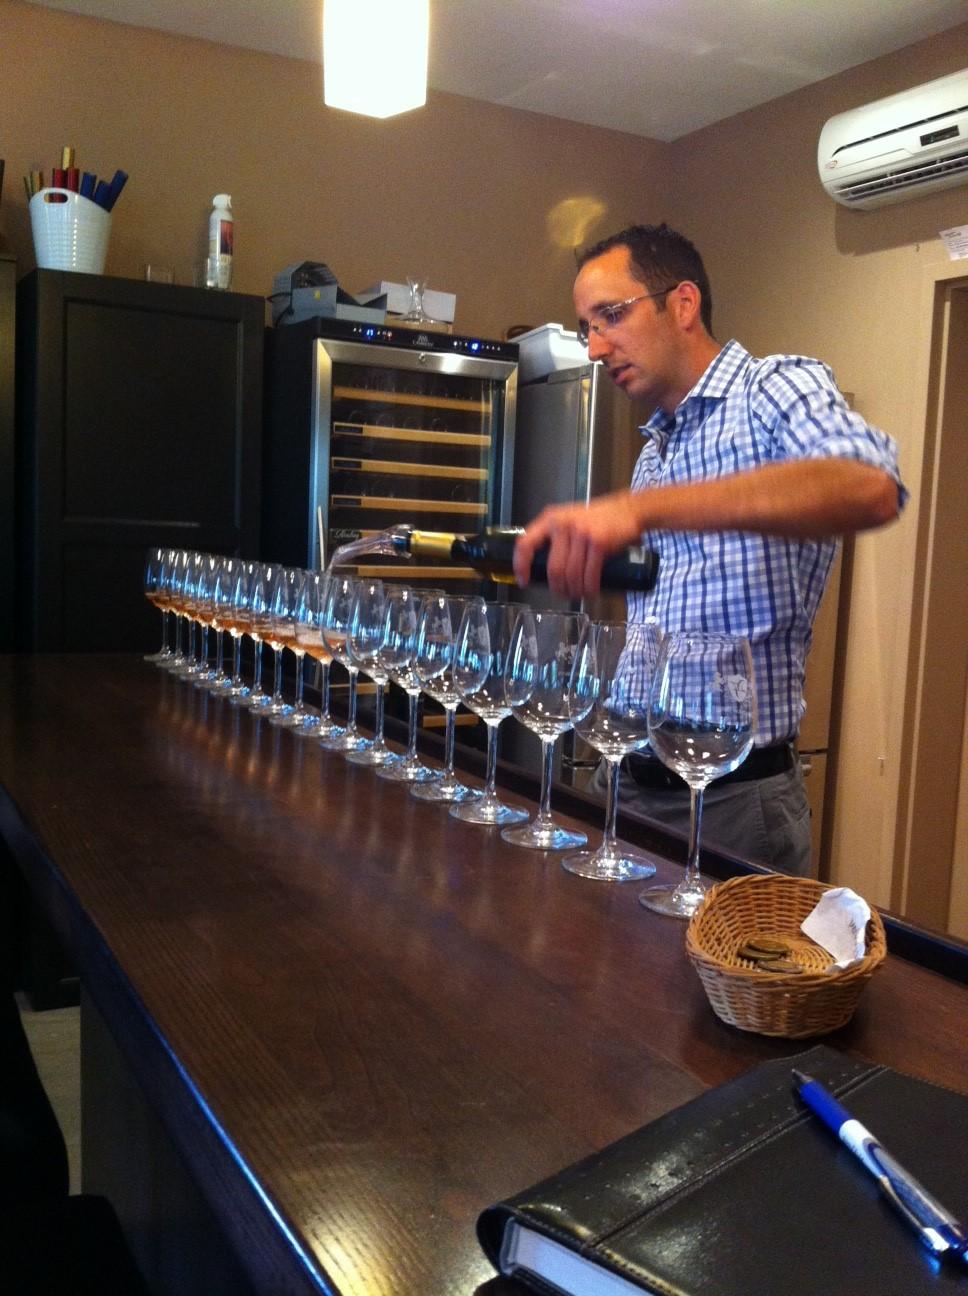 Un vignoble au Québec - Louis Thomas Vigneron - Agrimom.ca